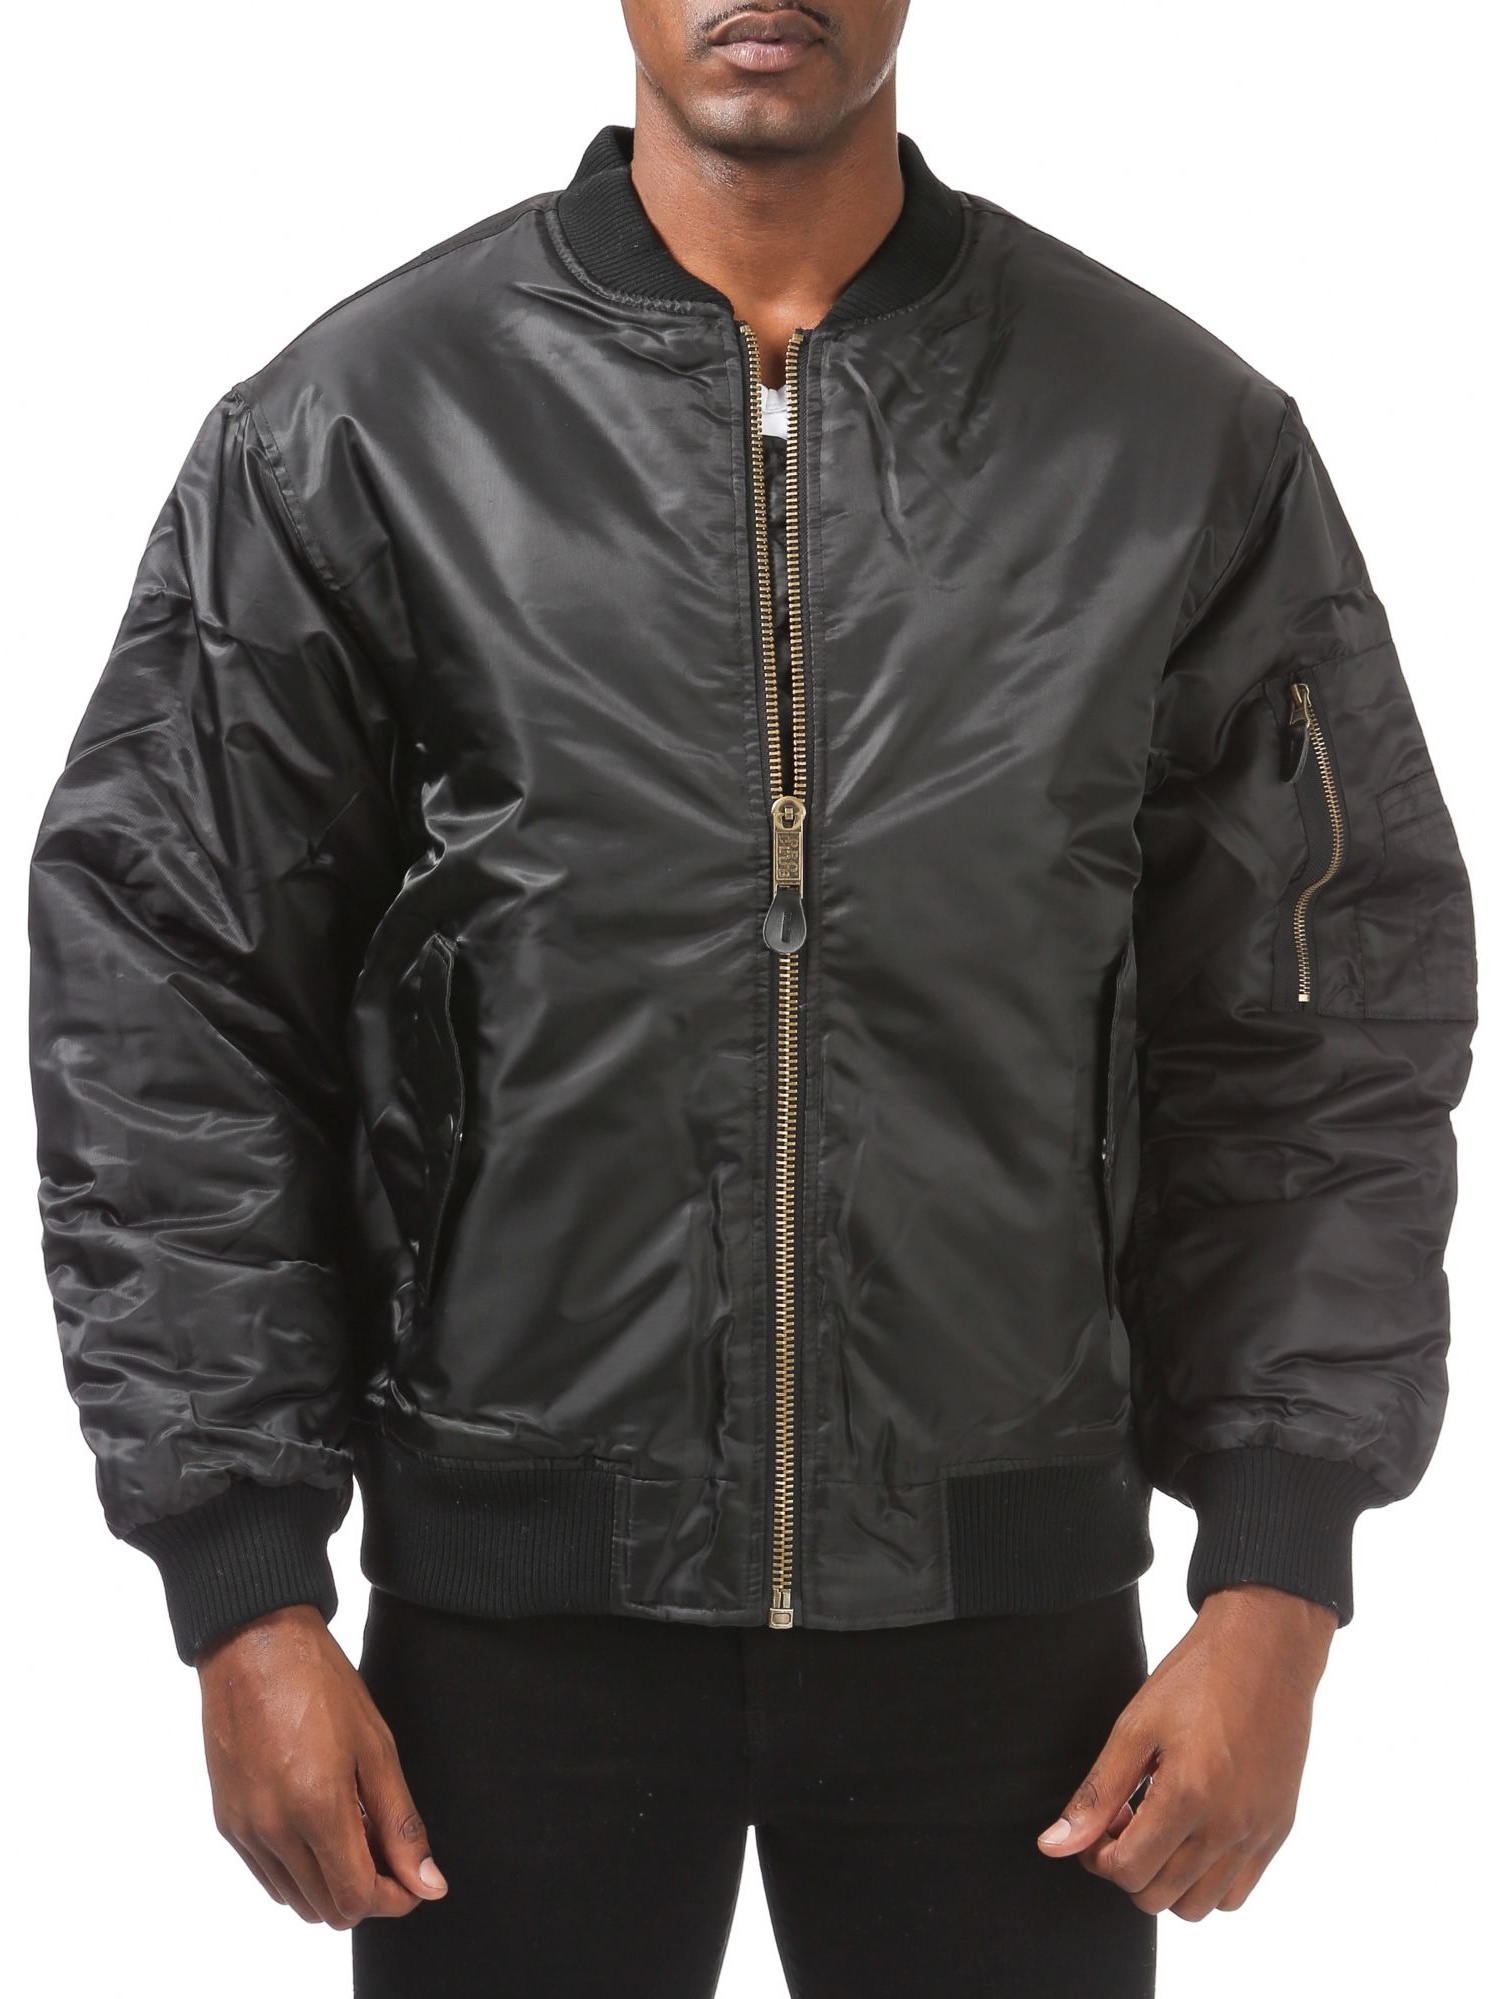 Pro Club Men's Flight Bomber Jacket, Small, Black